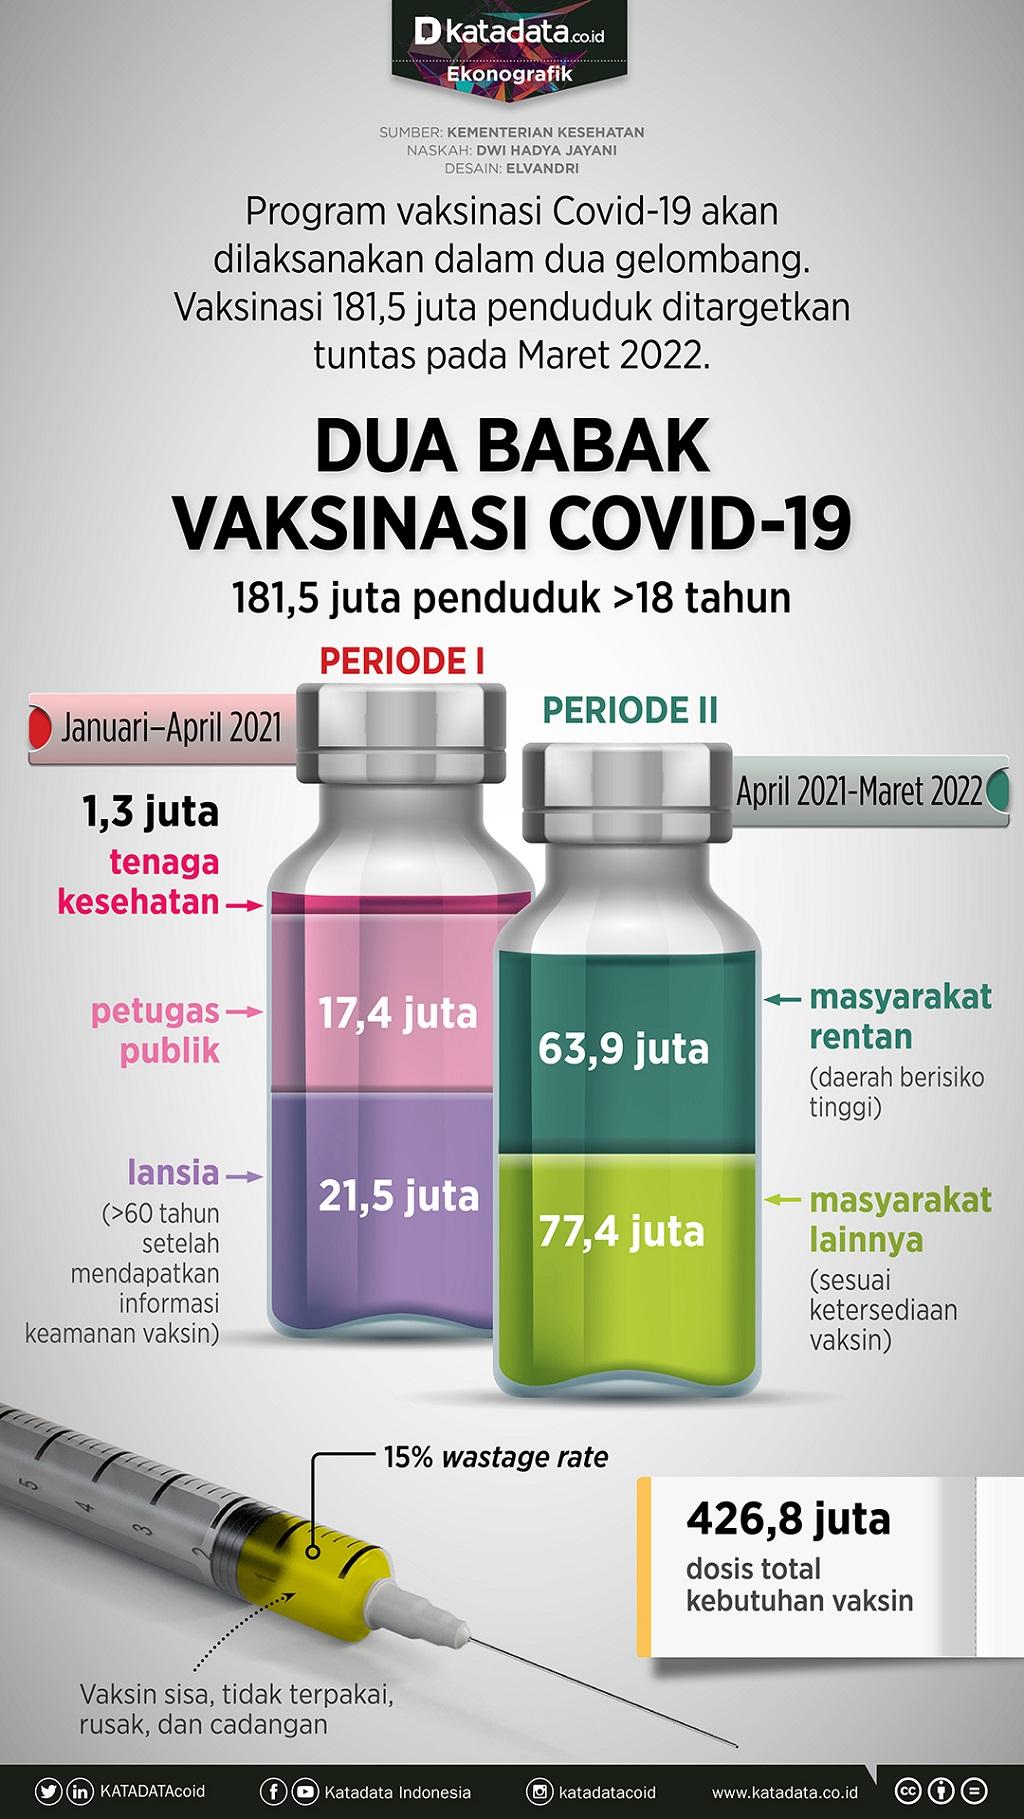 Infografik_Dua babak vaksinasi covid-19